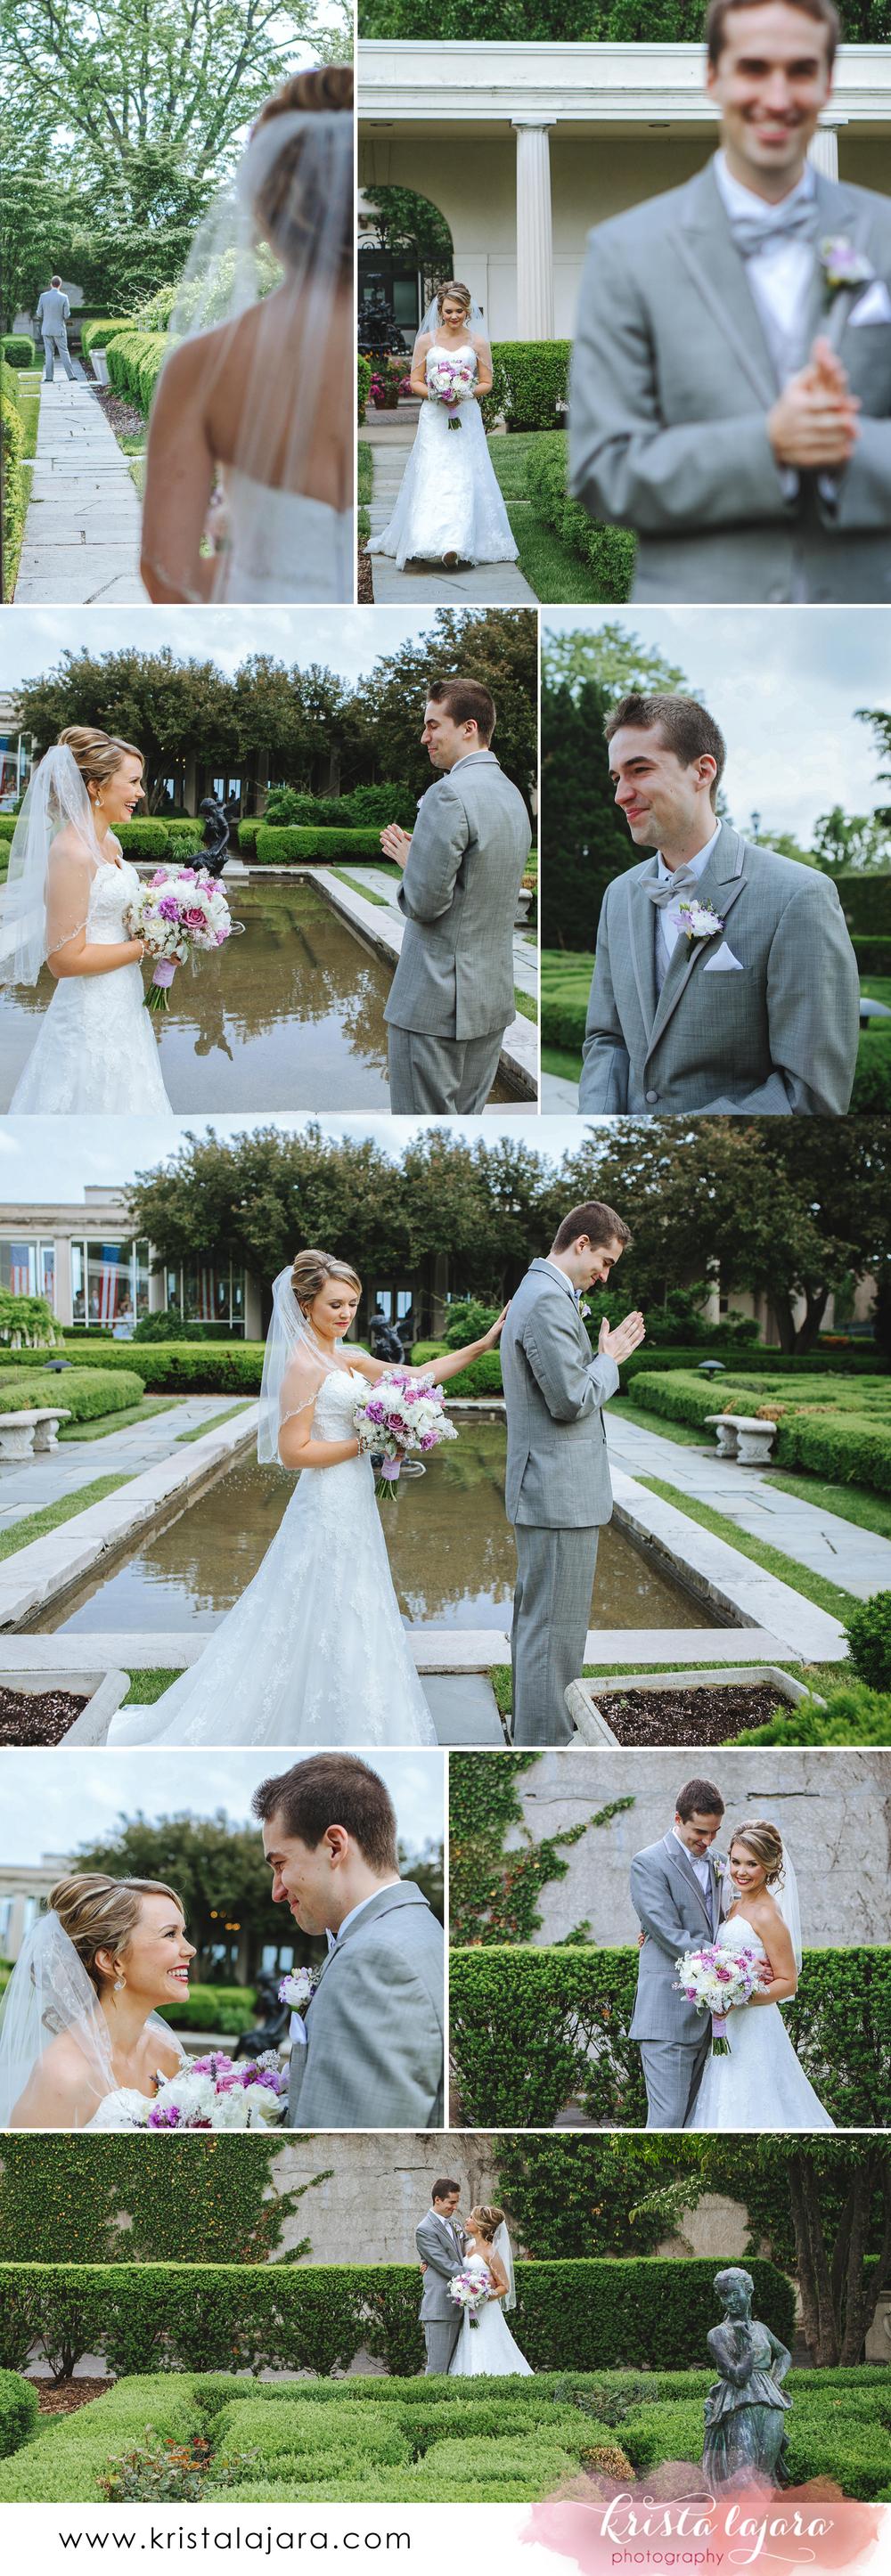 Krista Lajara Photography | www.klpstudios.co | Michigan Wedding: First Look